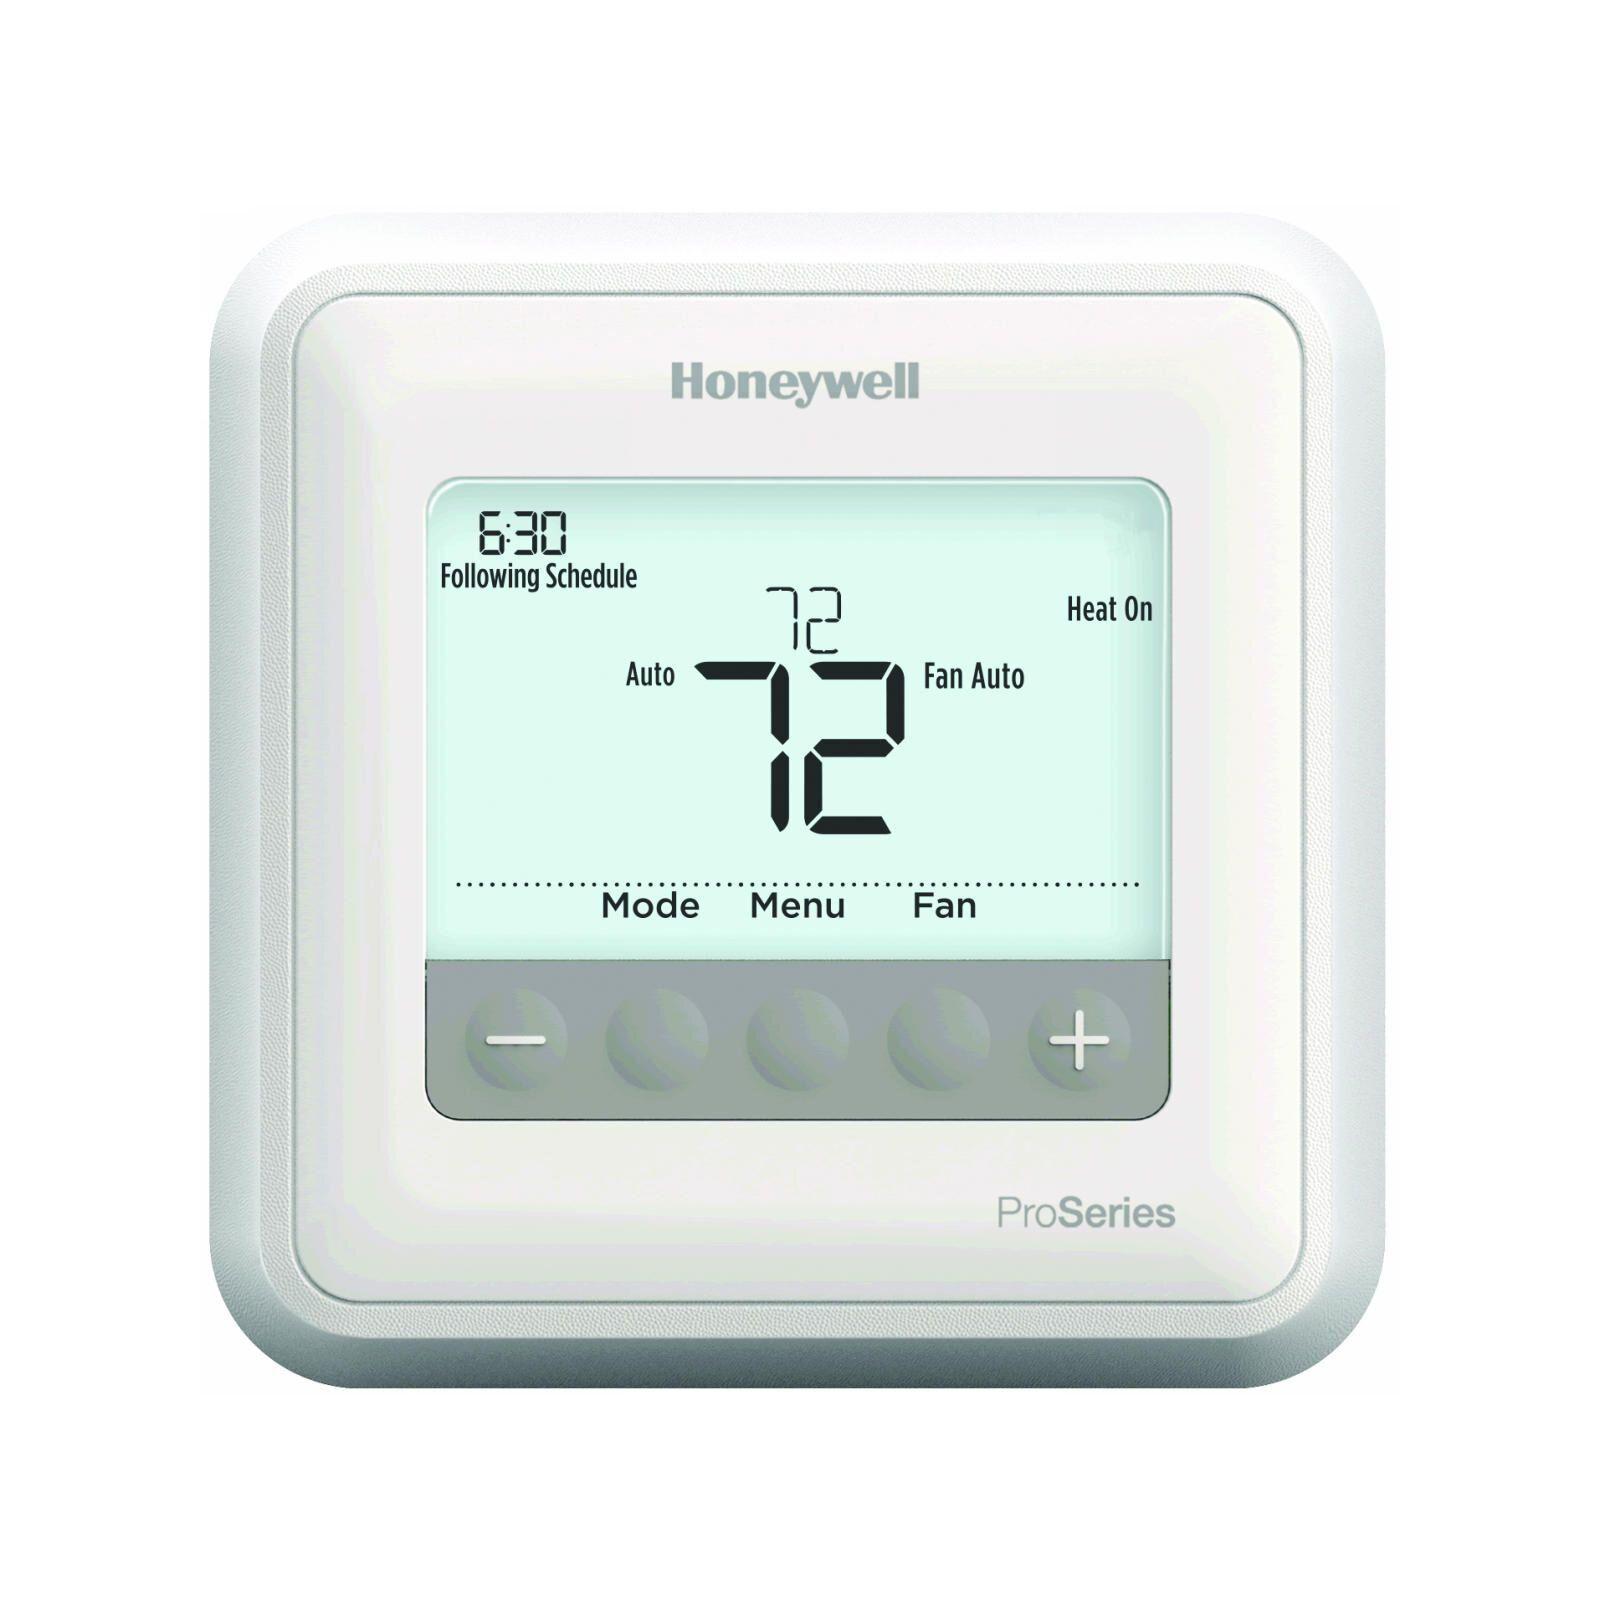 Honeywell Th6210u2001 U T6 Pro Programmable Thermostat Diy Parts Programmable Thermostat Diy Thermostat Thermostat